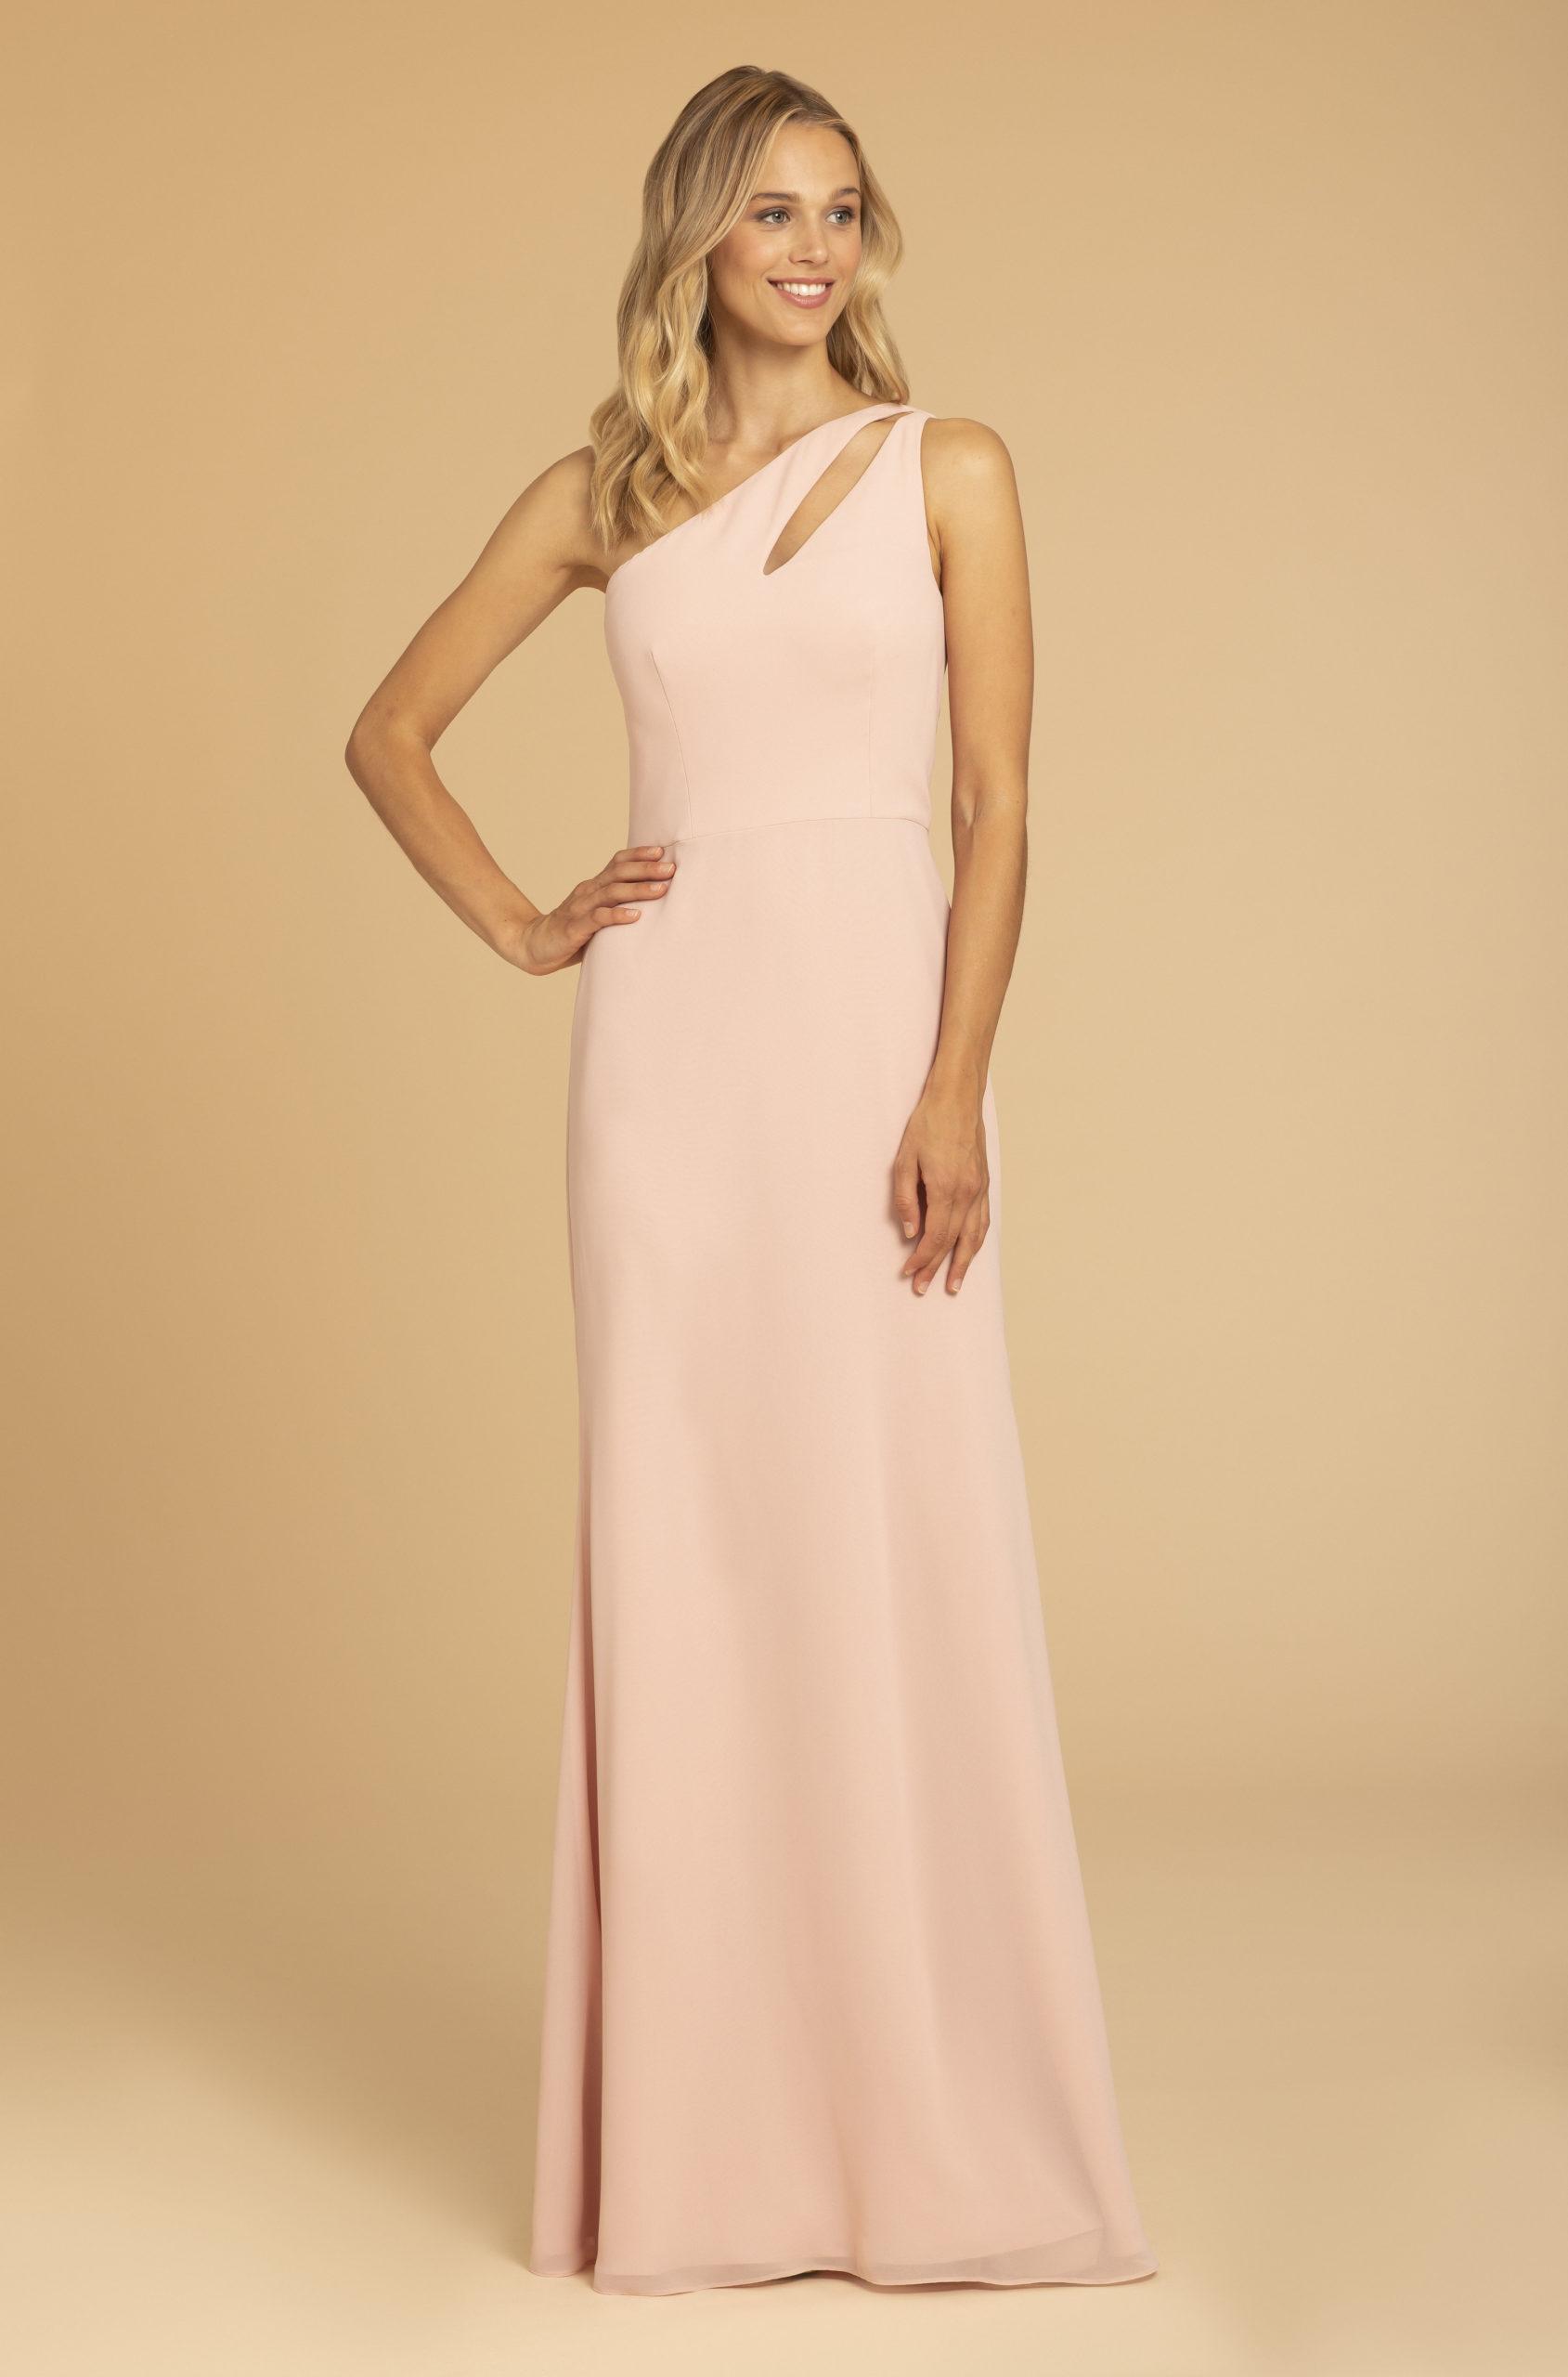 berlin 52004 hayley paige pink bridesmaid dresses